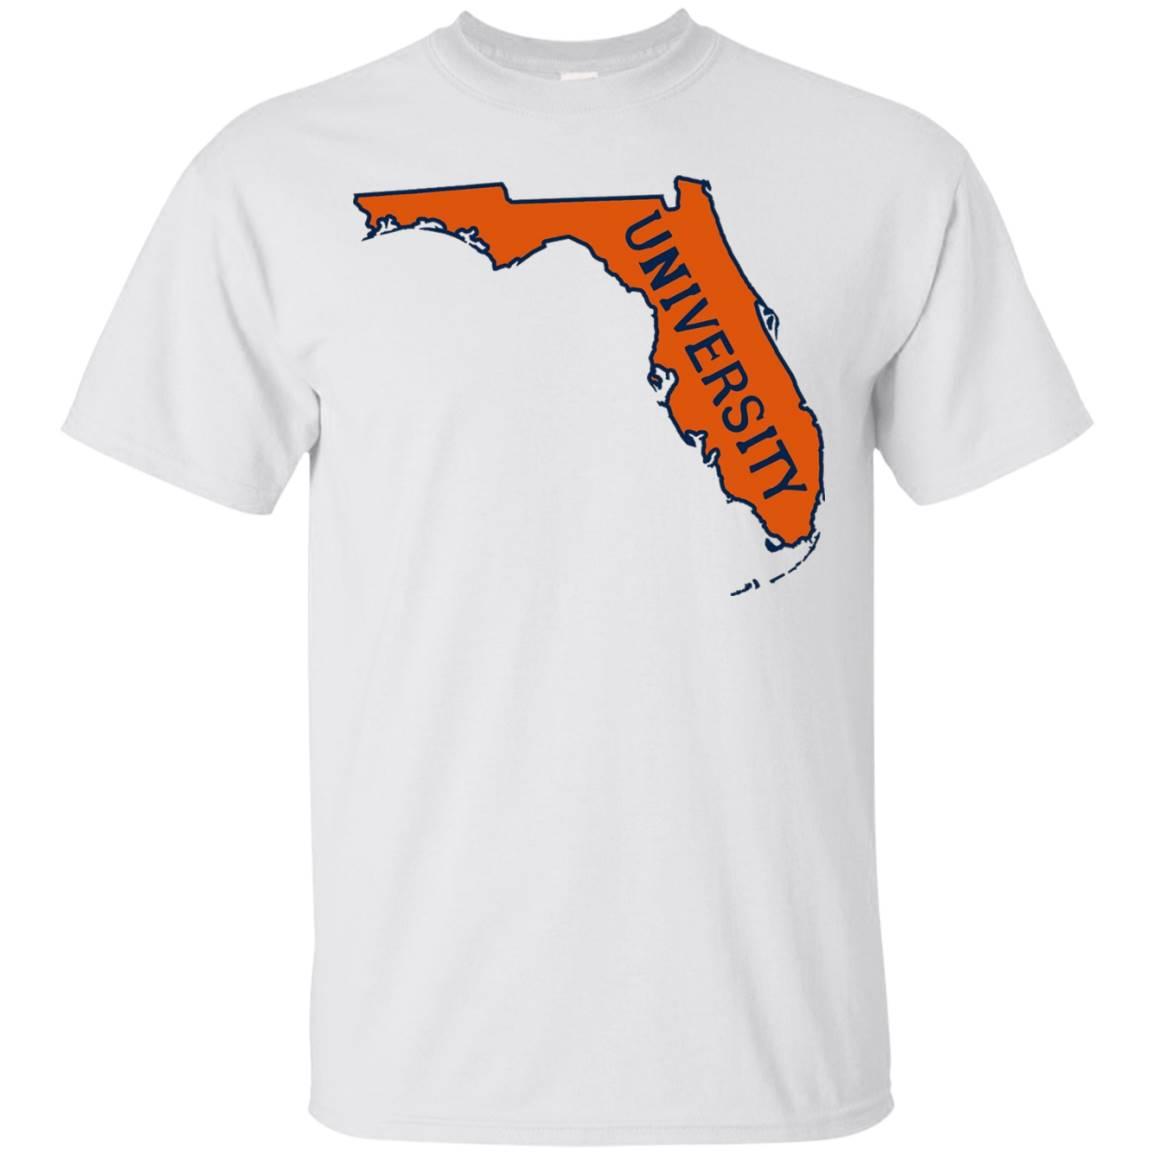 Florida Gators Fans. T-Shirt. Sizes Up To 3XL.